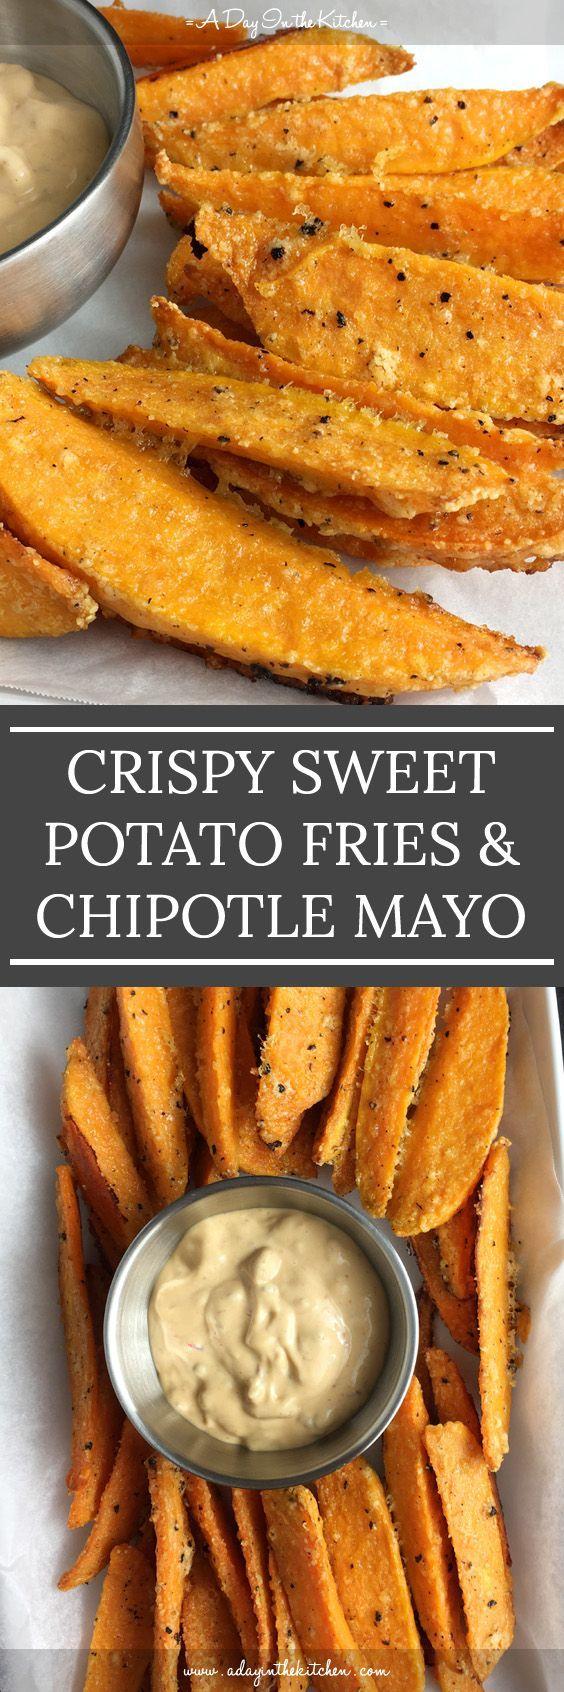 Crispy Sweet Potato Fries & Chipotle Mayo